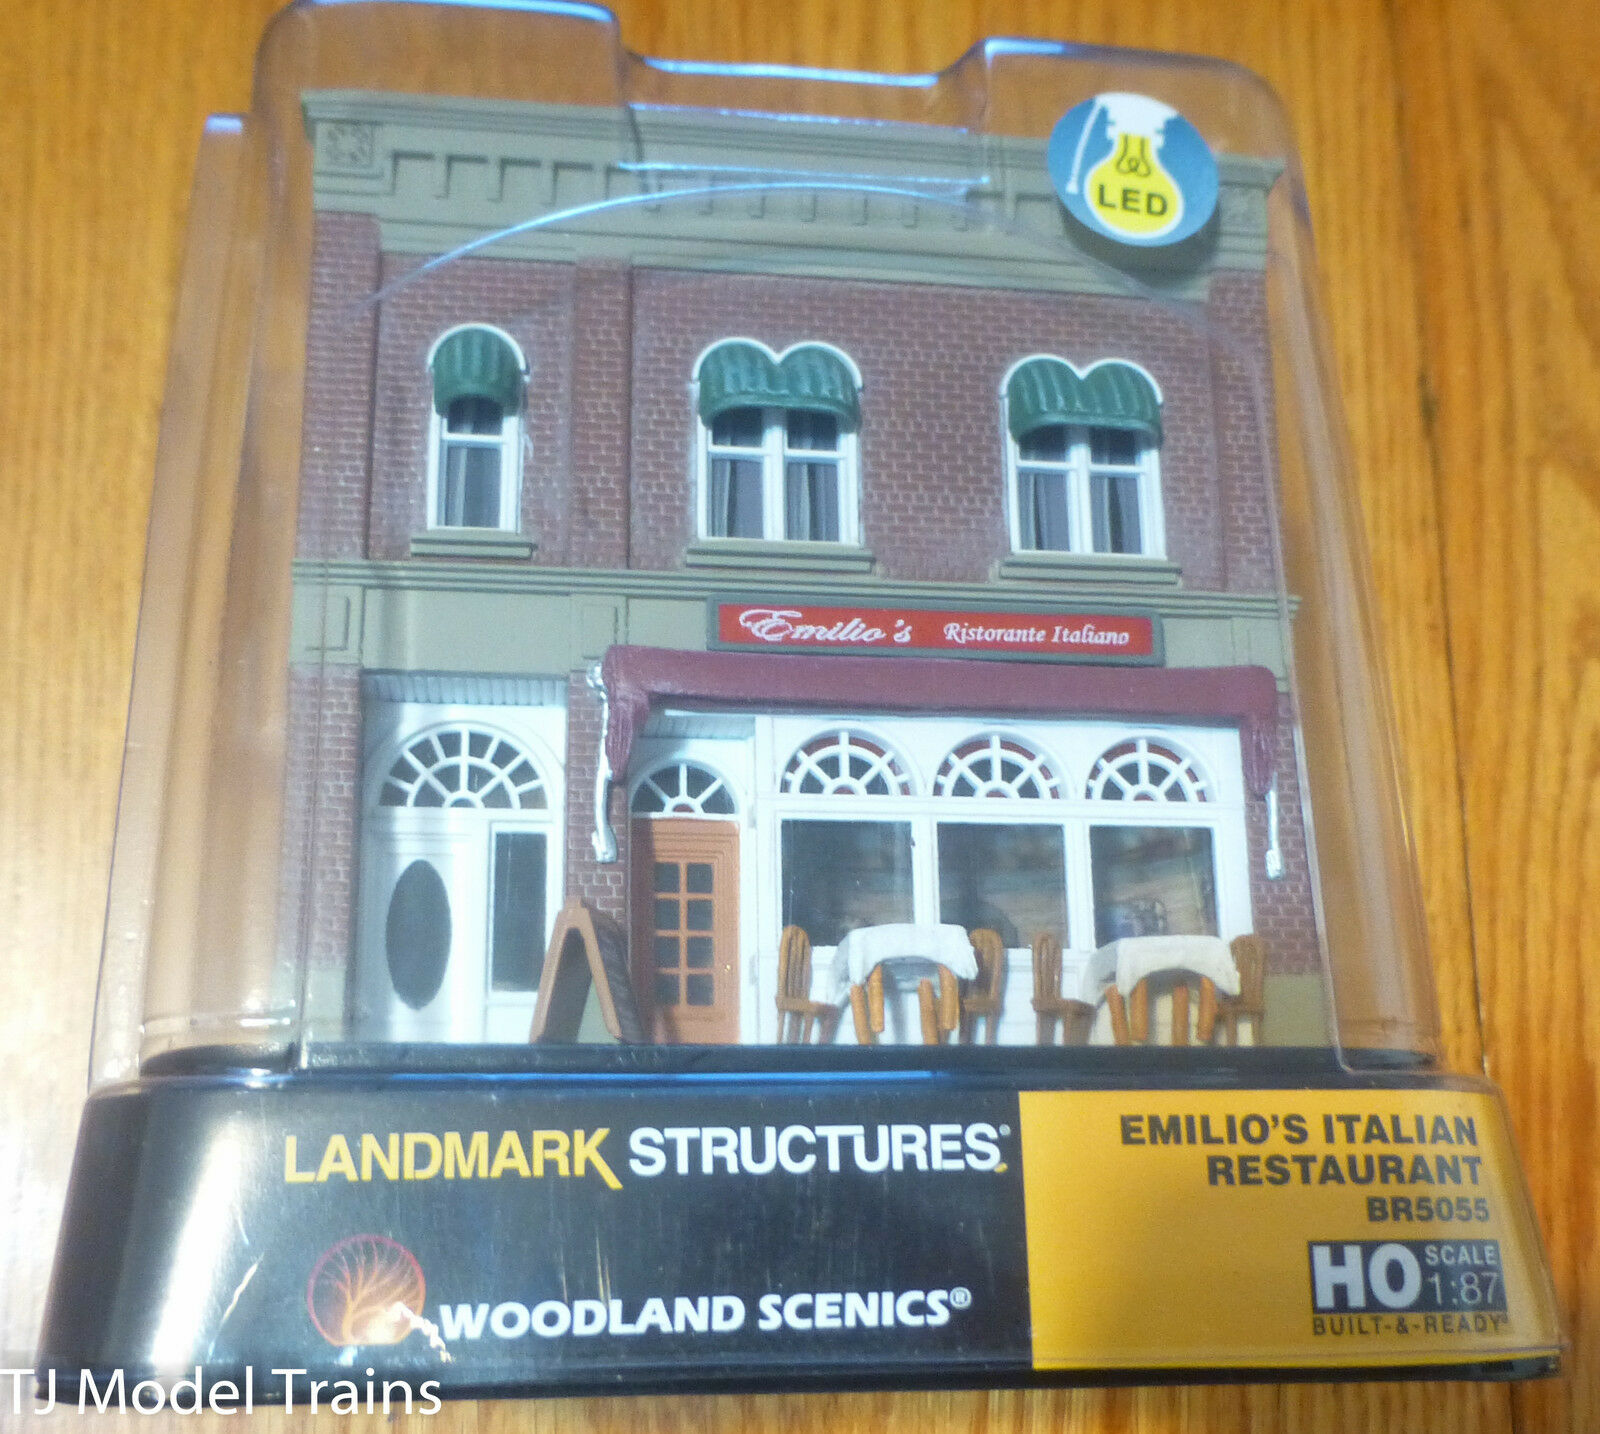 Woodland Scenics  5055 Emilio's Italian Restaurant  HO Scale  1:87th Scale